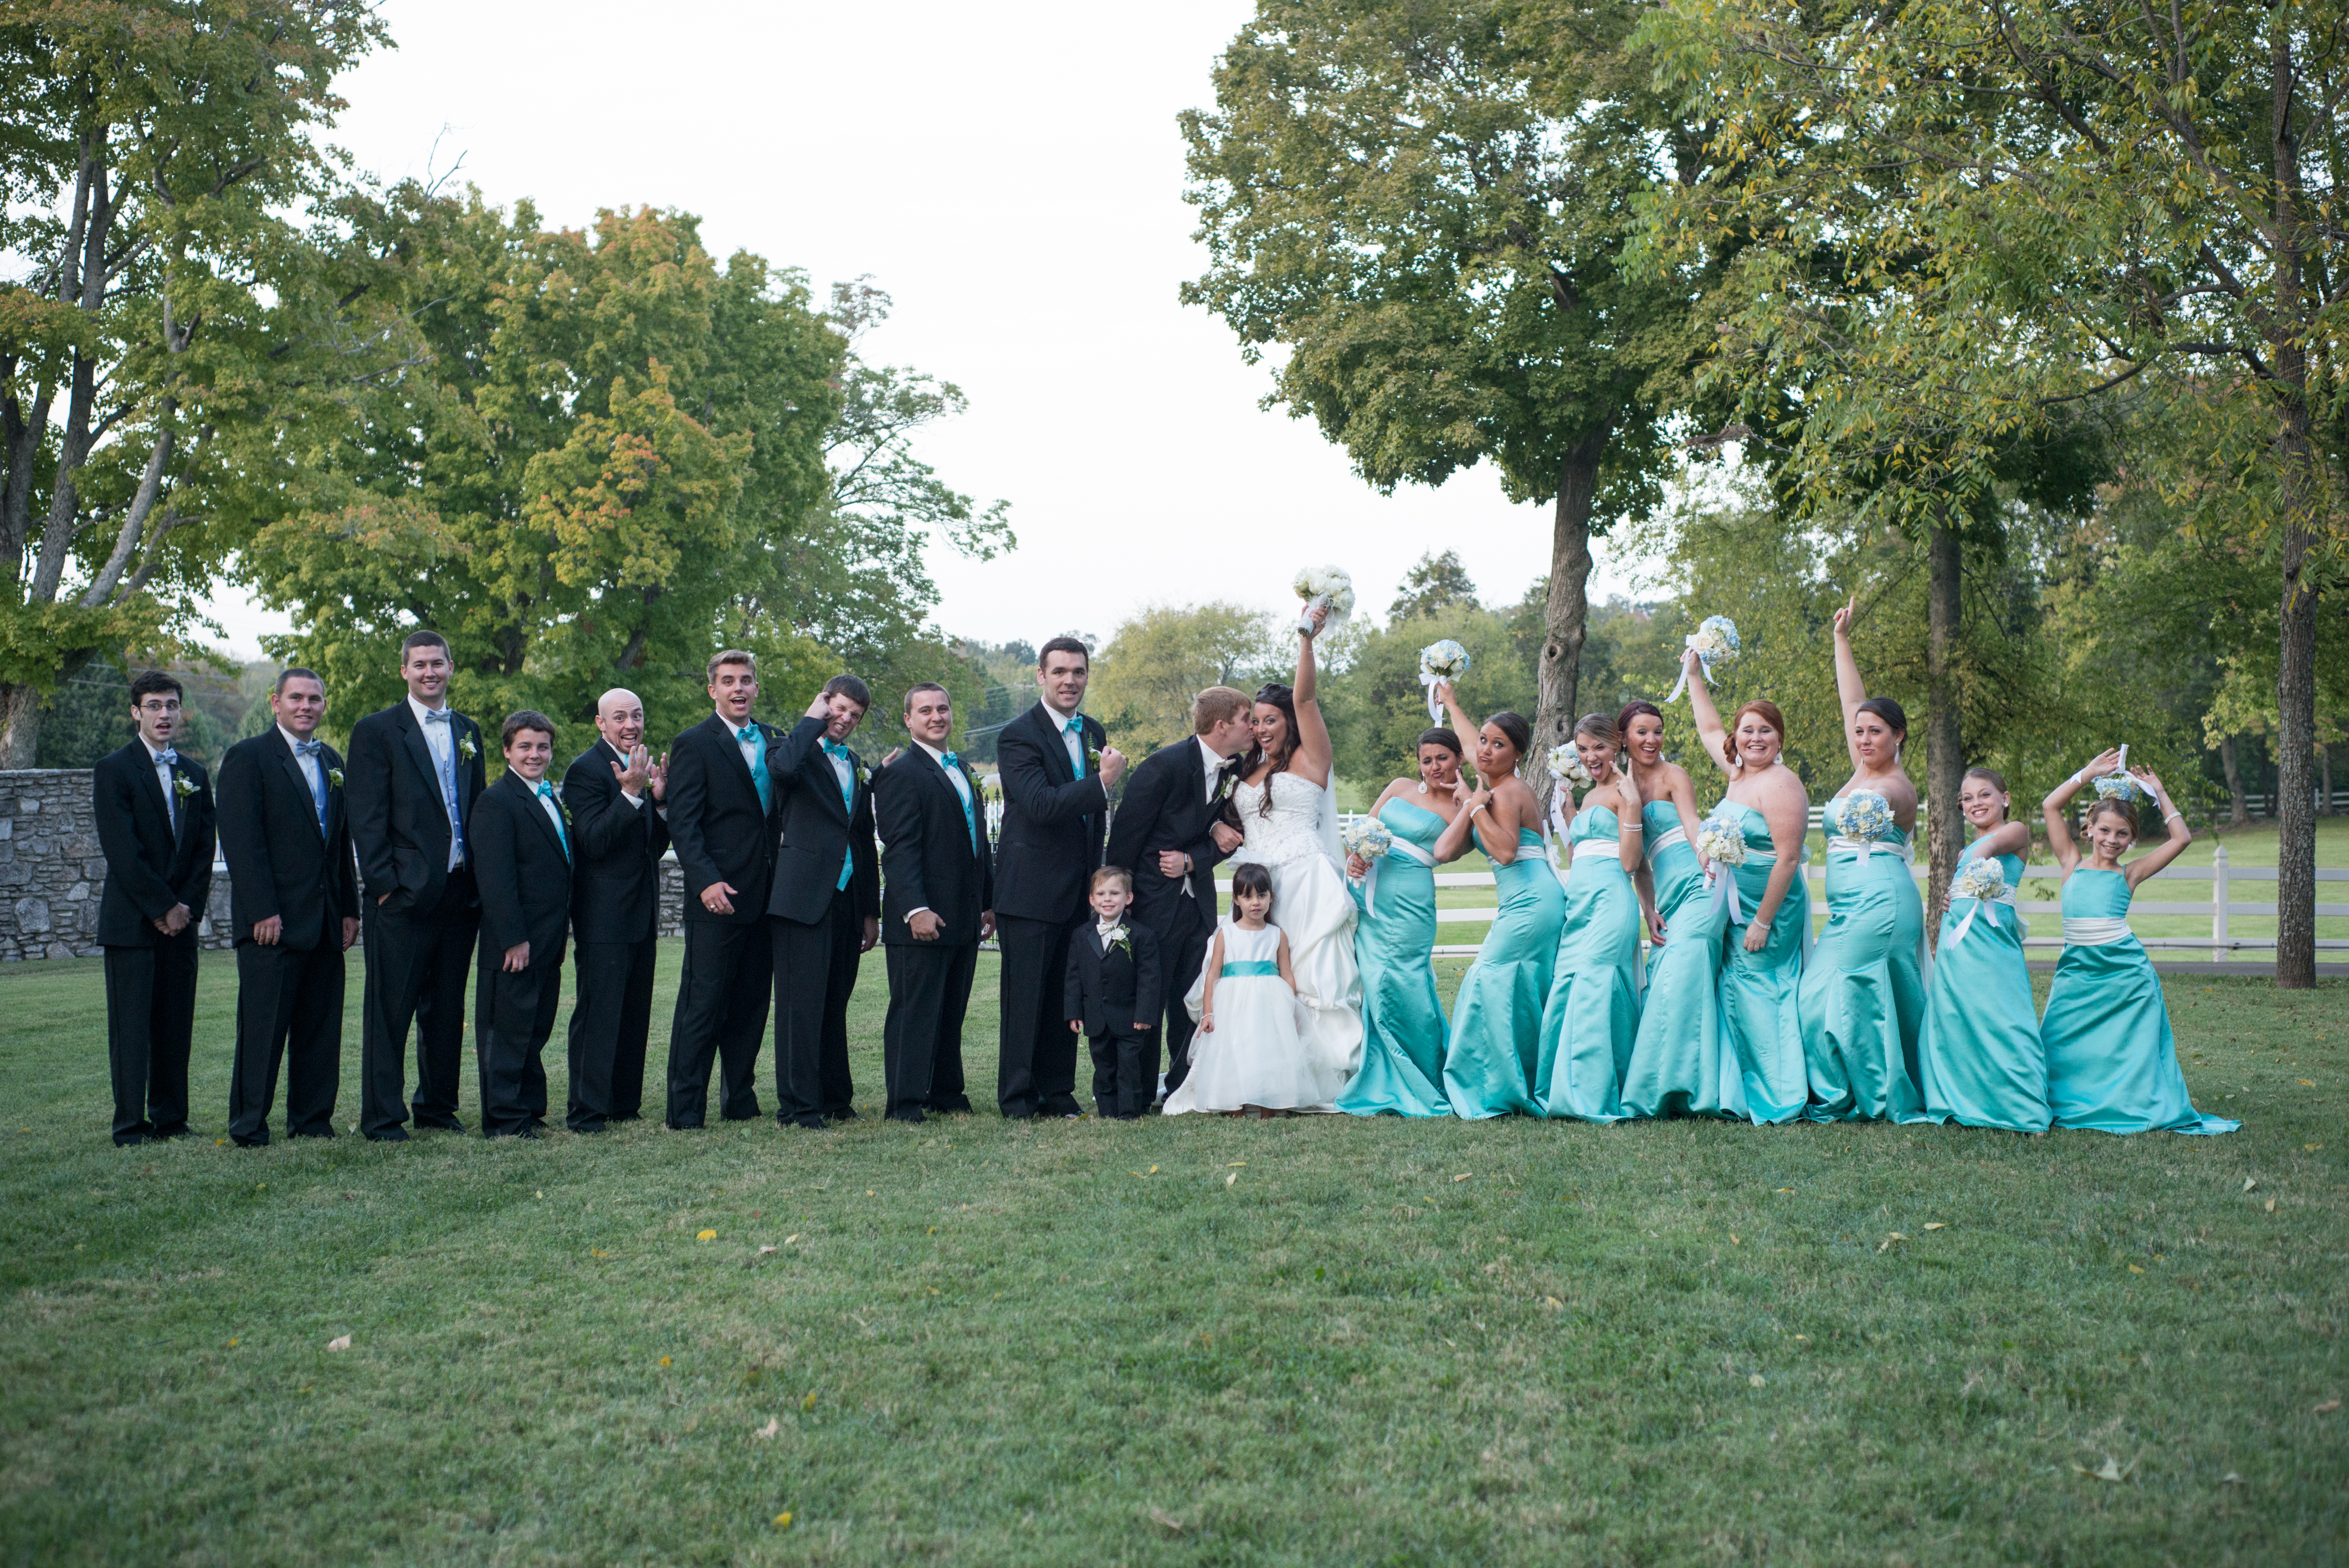 Matt-Blakely-wedding-nashville-tn-legacy-farms-1016